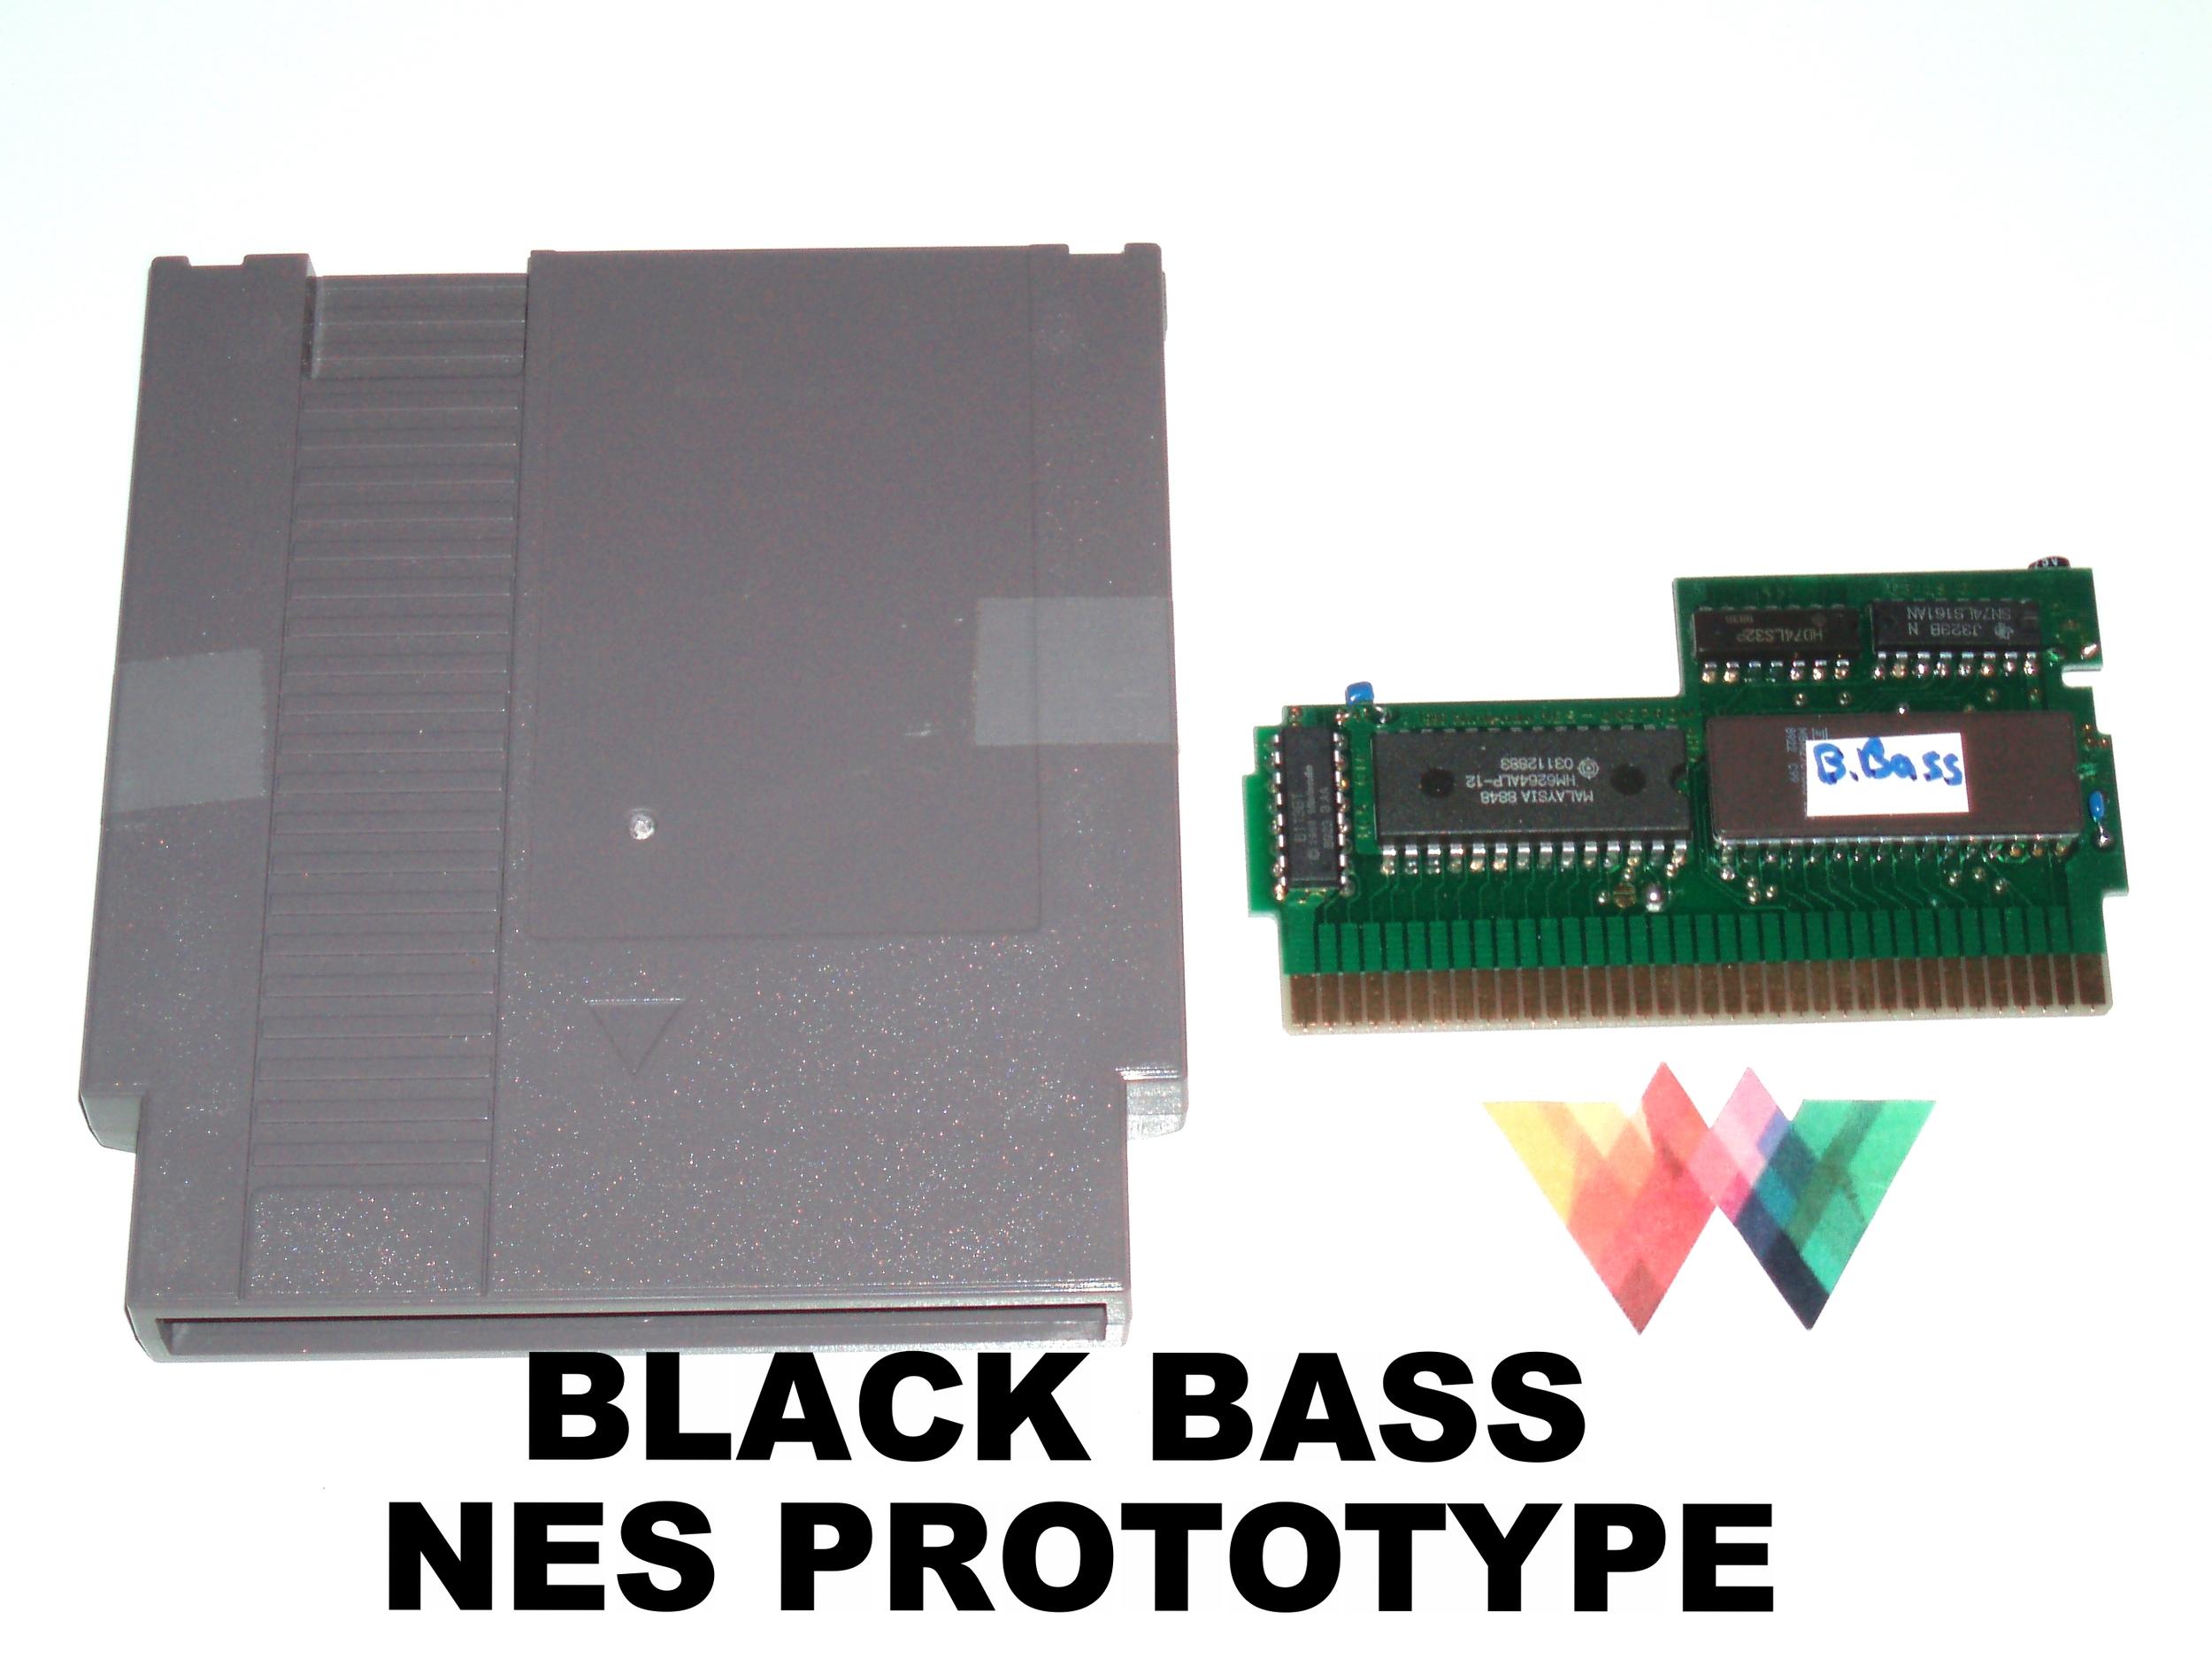 Black Bass Prototype